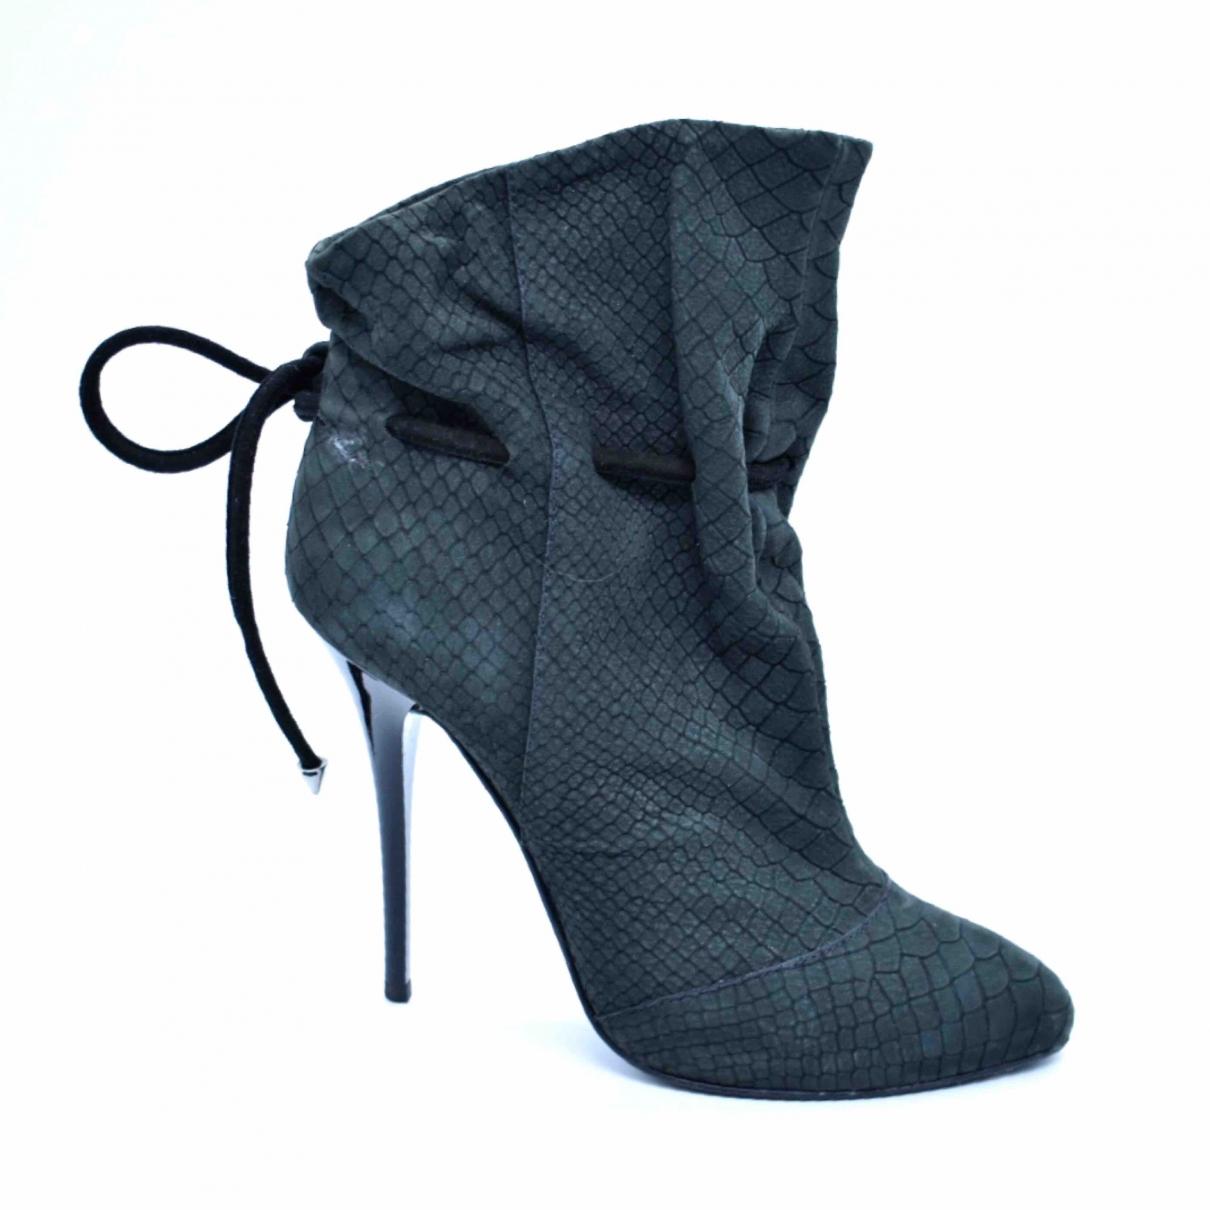 Giuseppe Zanotti - Boots   pour femme en cuir - anthracite